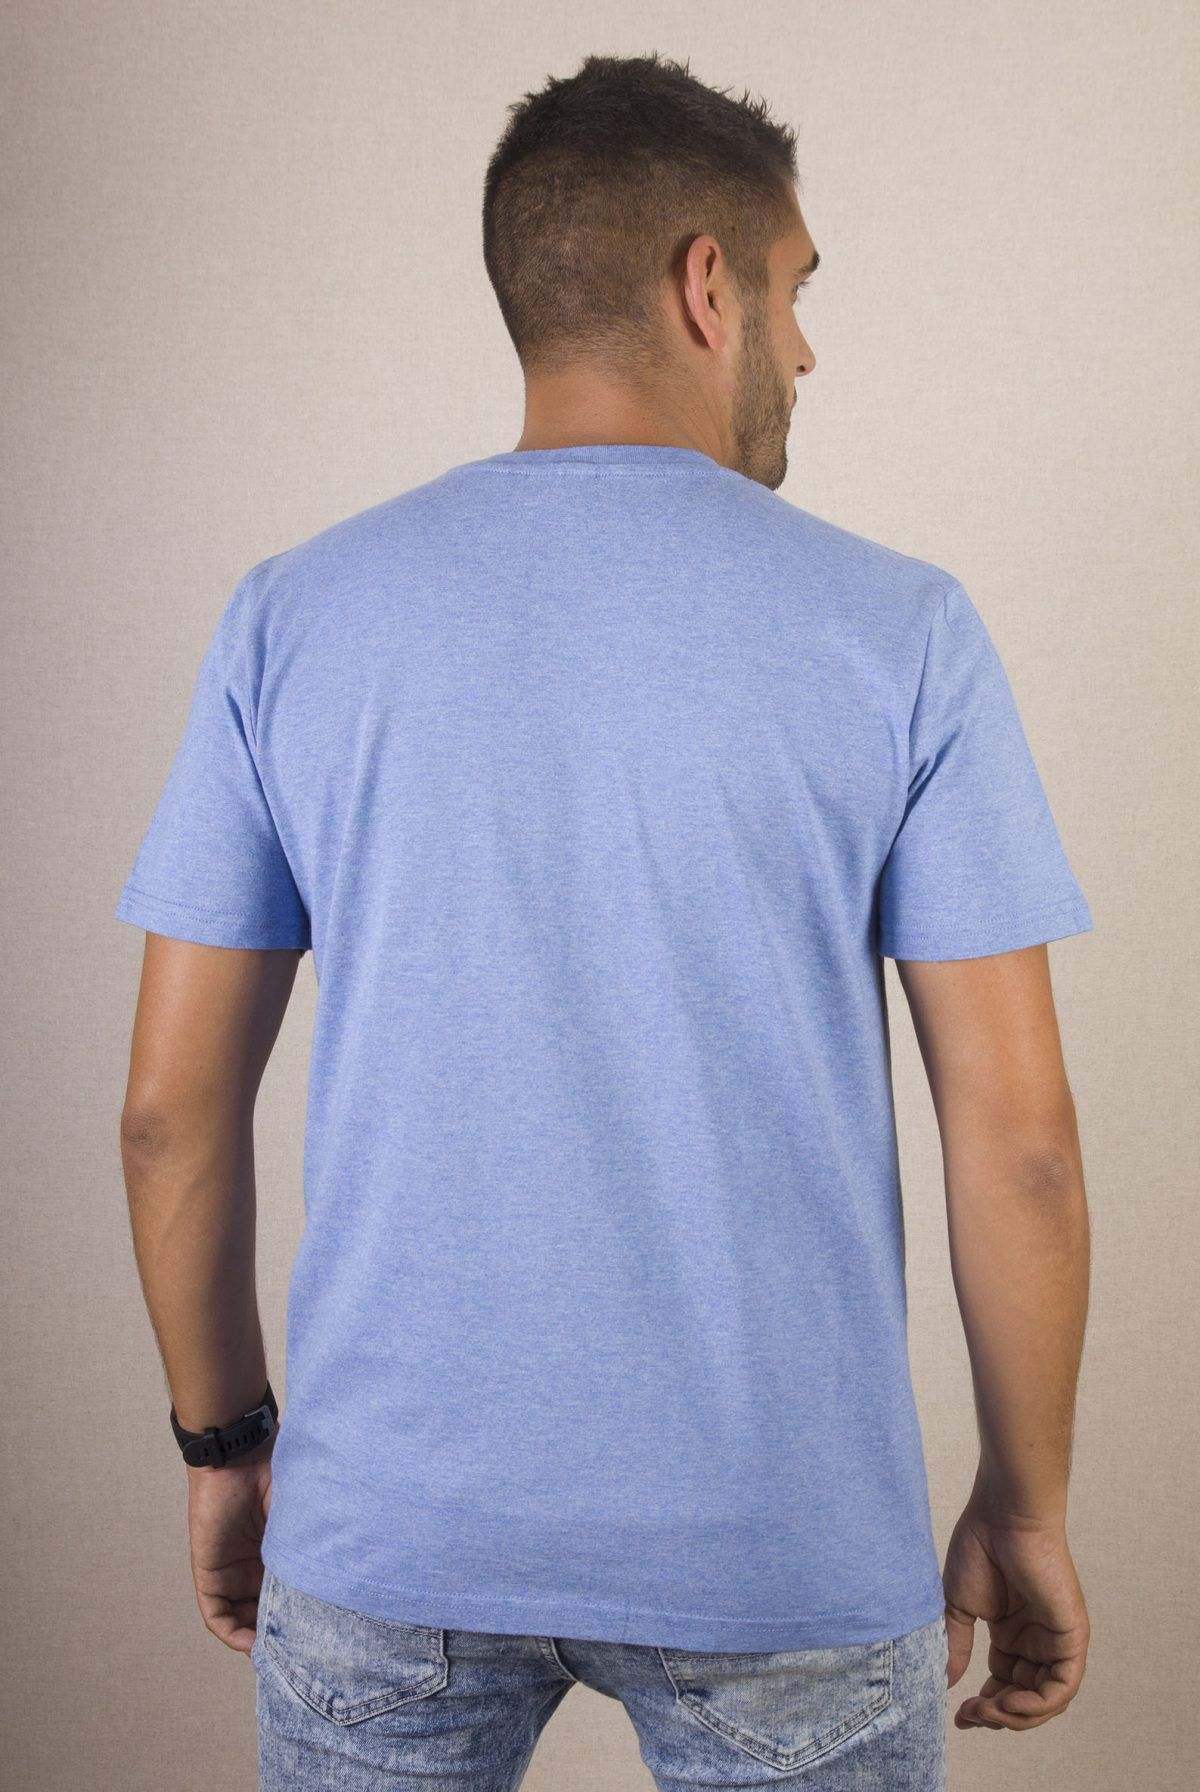 Camiseta Rinoceronte-sirem wild